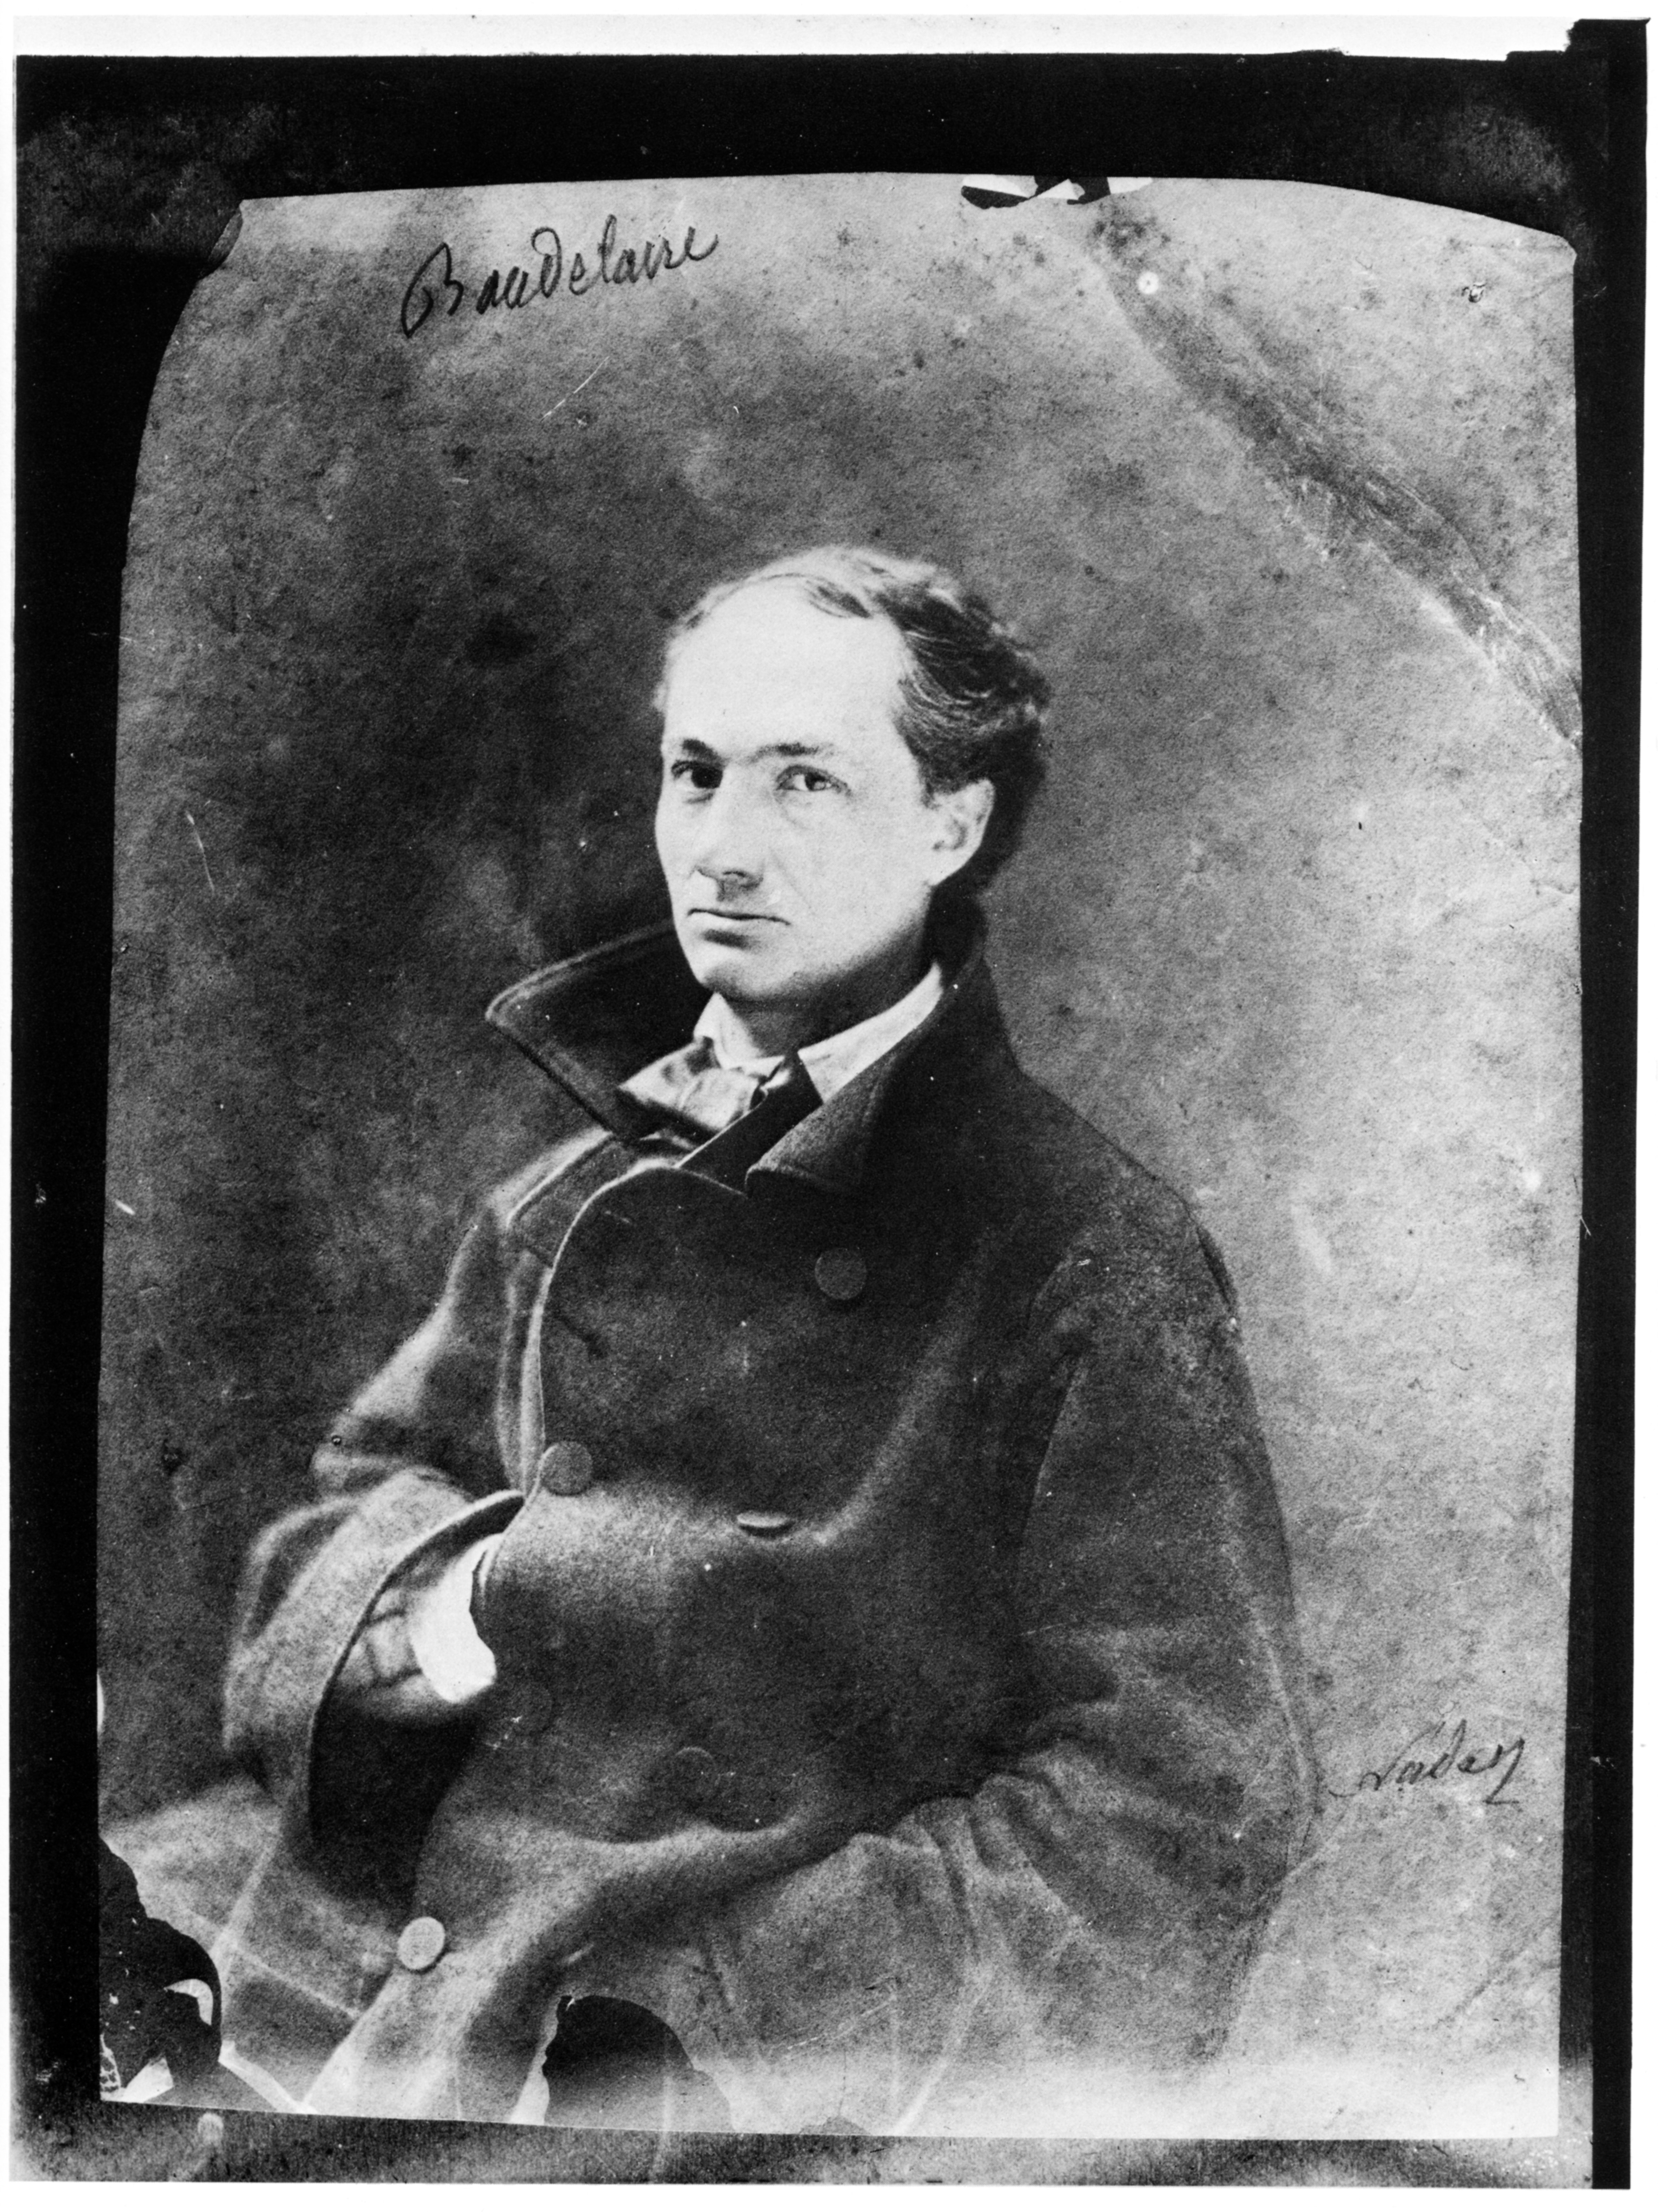 http://upload.wikimedia.org/wikipedia/commons/8/85/Charles_Baudelaire_1855_Nadar.jpg